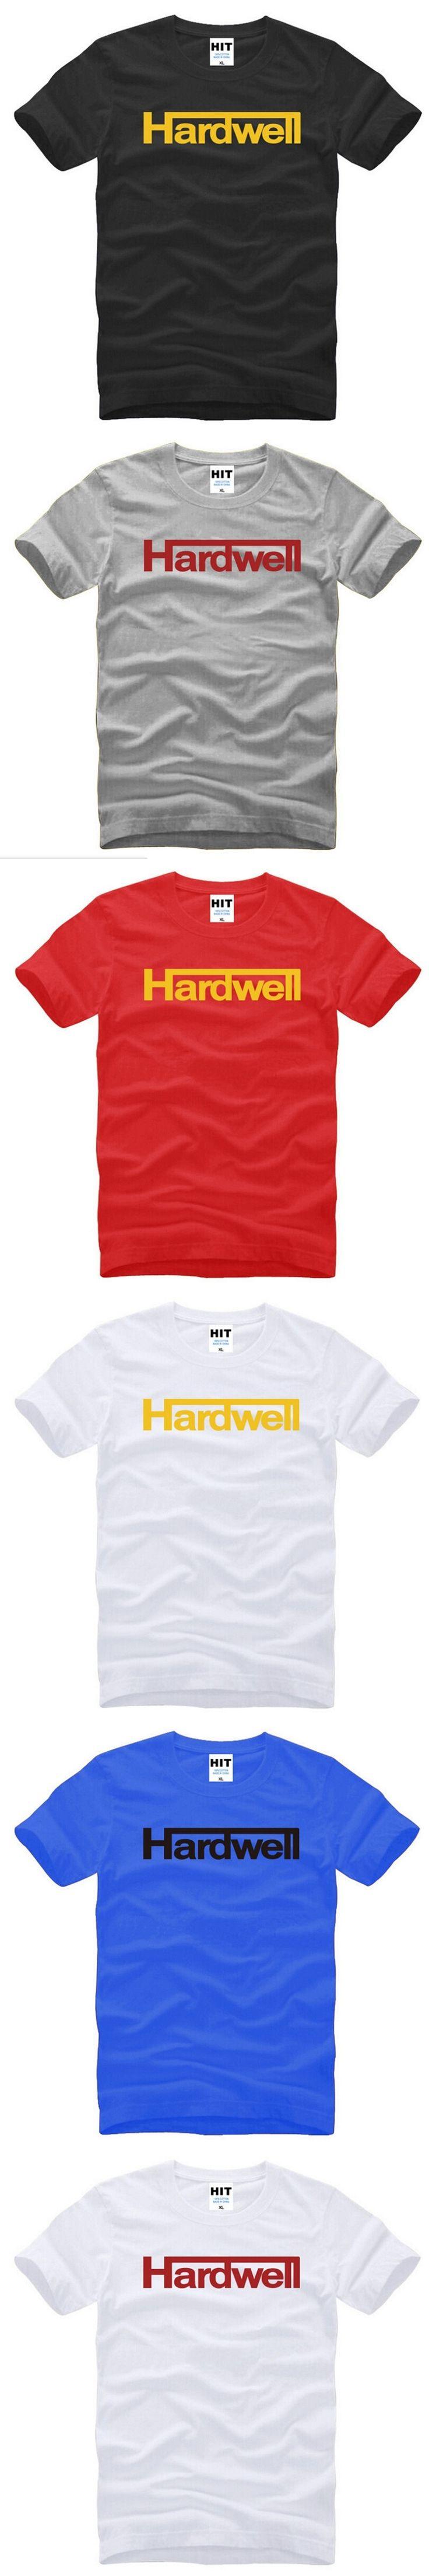 Hardwell Rock Band T Shirts Men Hip Hop O Neck Leisure T-shirt Music Fans Clothes Vegas Rage DJ Club Life Plur Edm Edc Tshirt